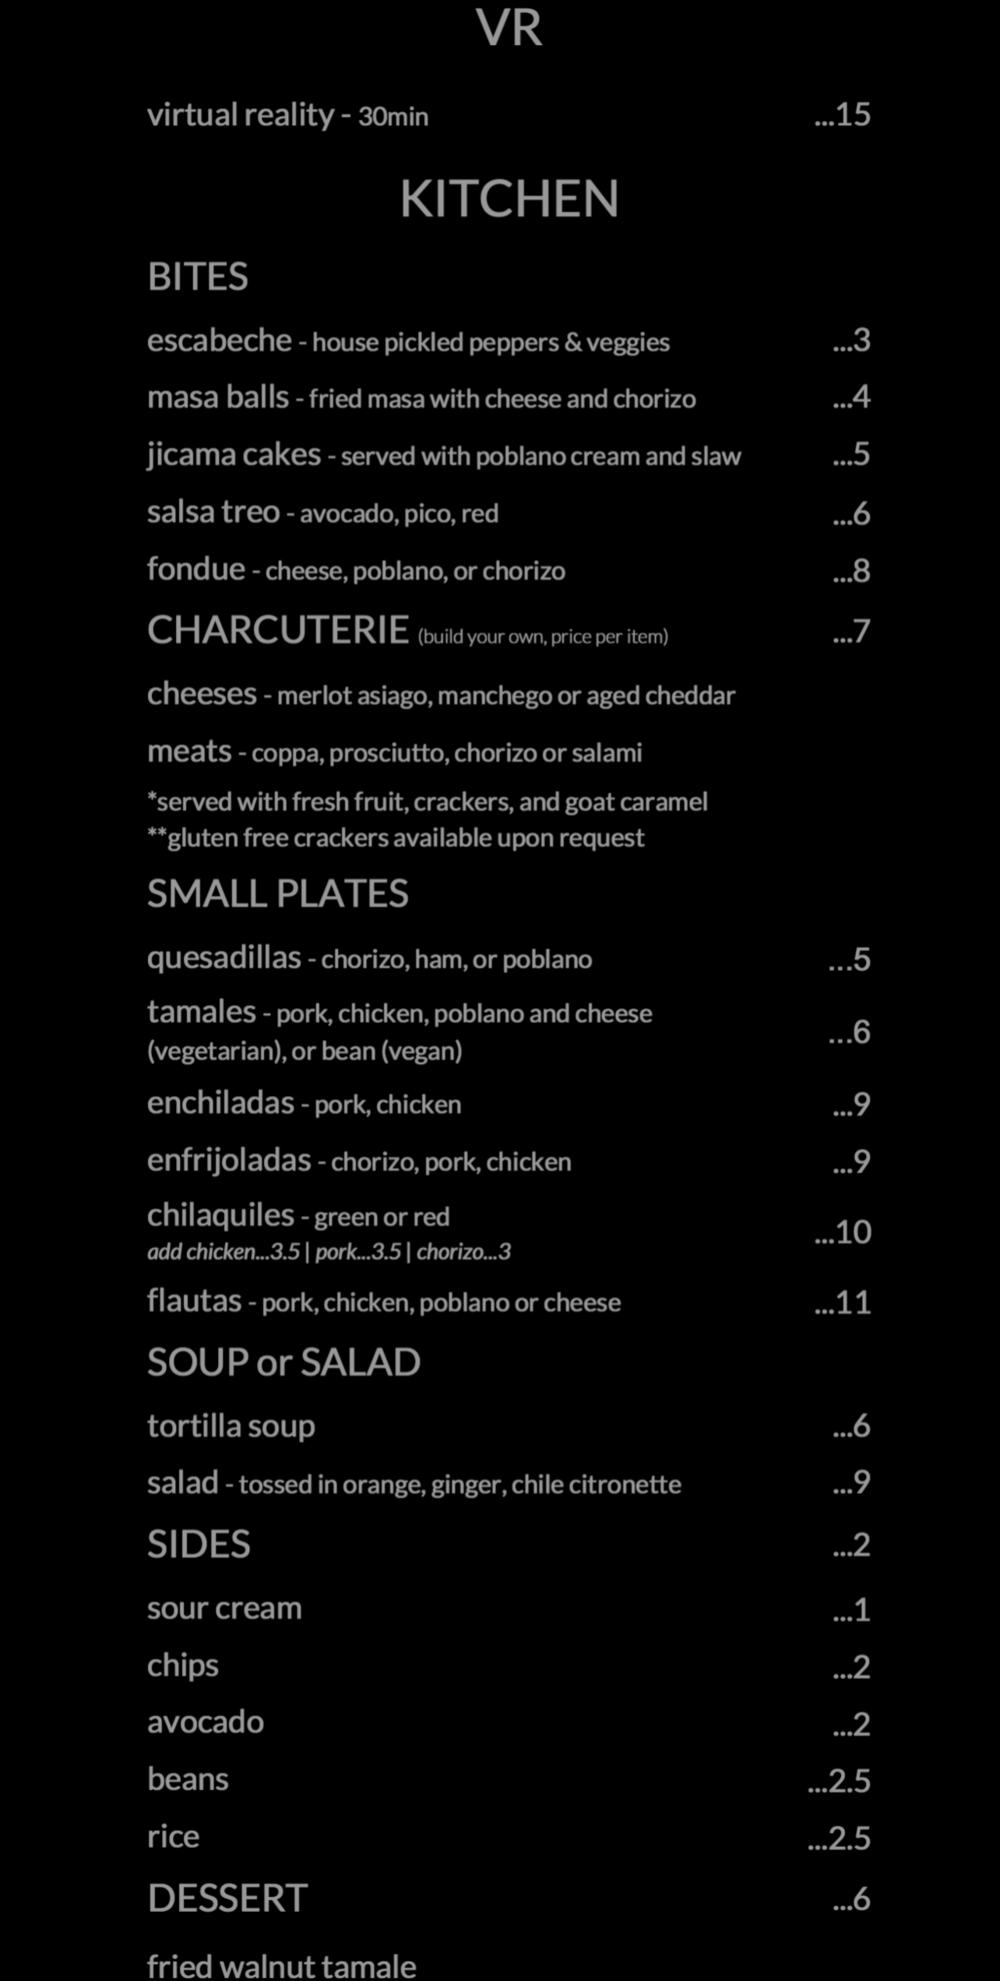 DinnerMenuWebsite.png